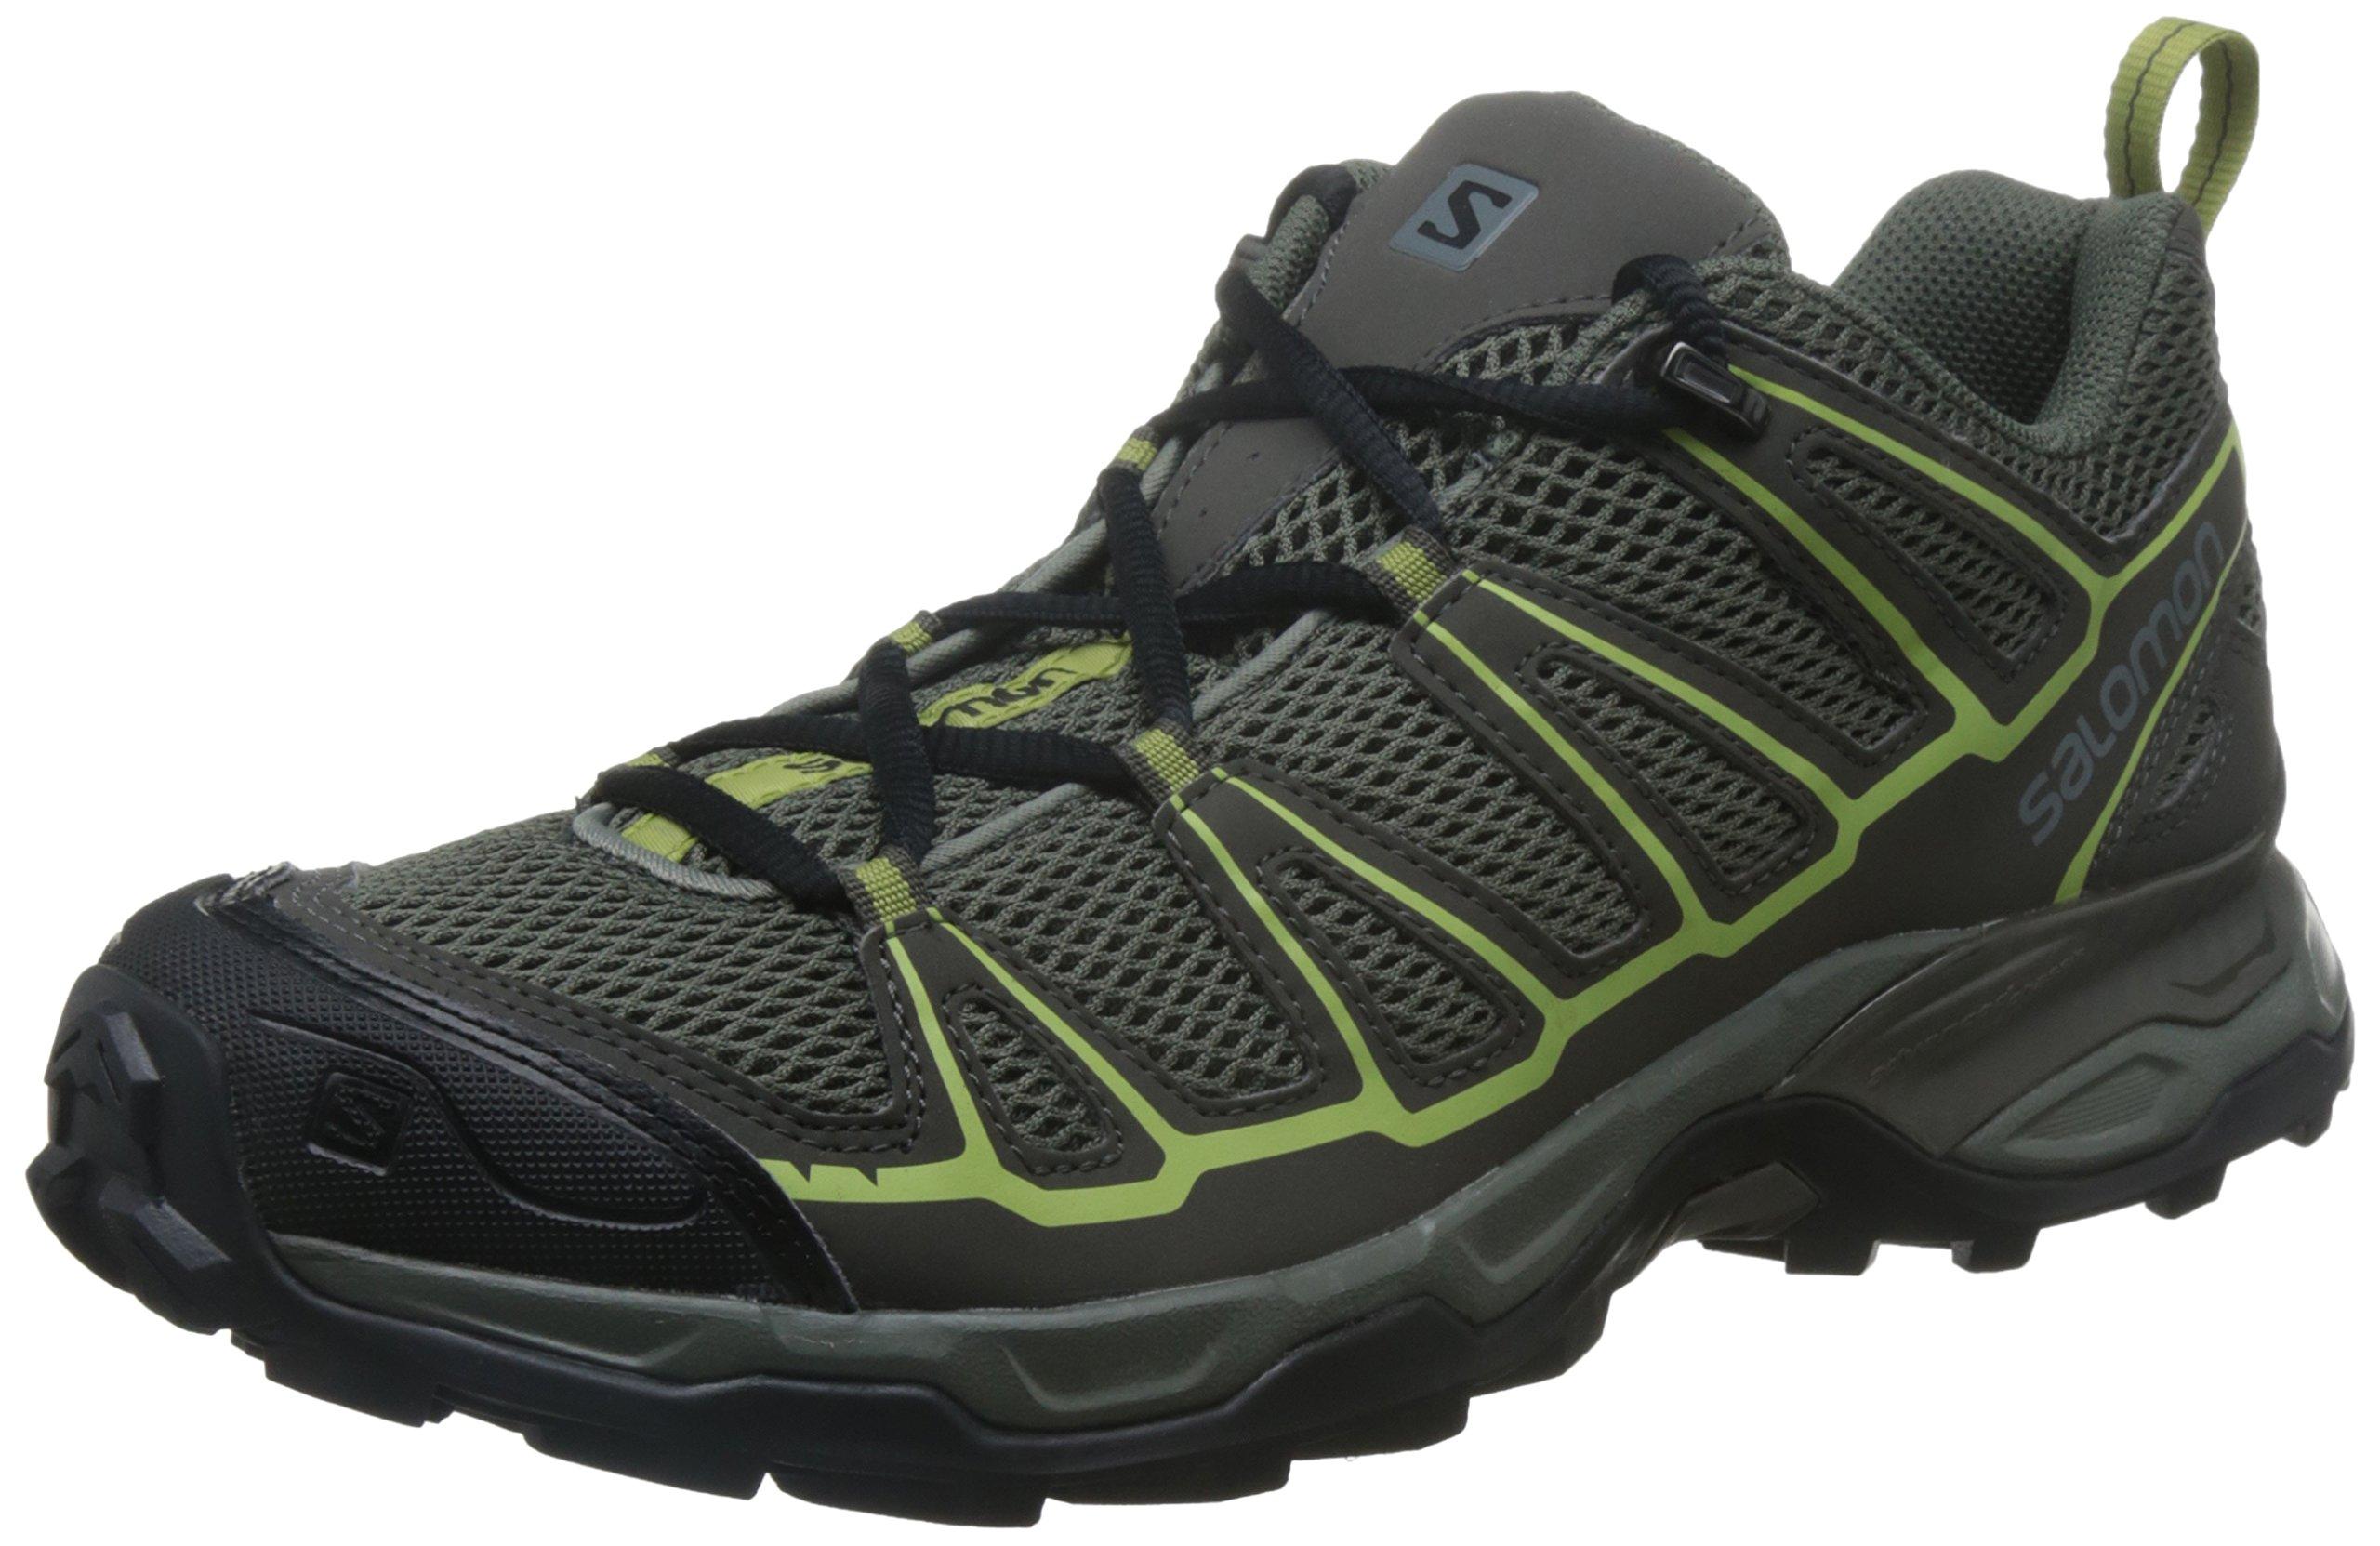 Salomon Men's X Ultra Prime Hiking Shoe, Castor Gray, 10.5 M US